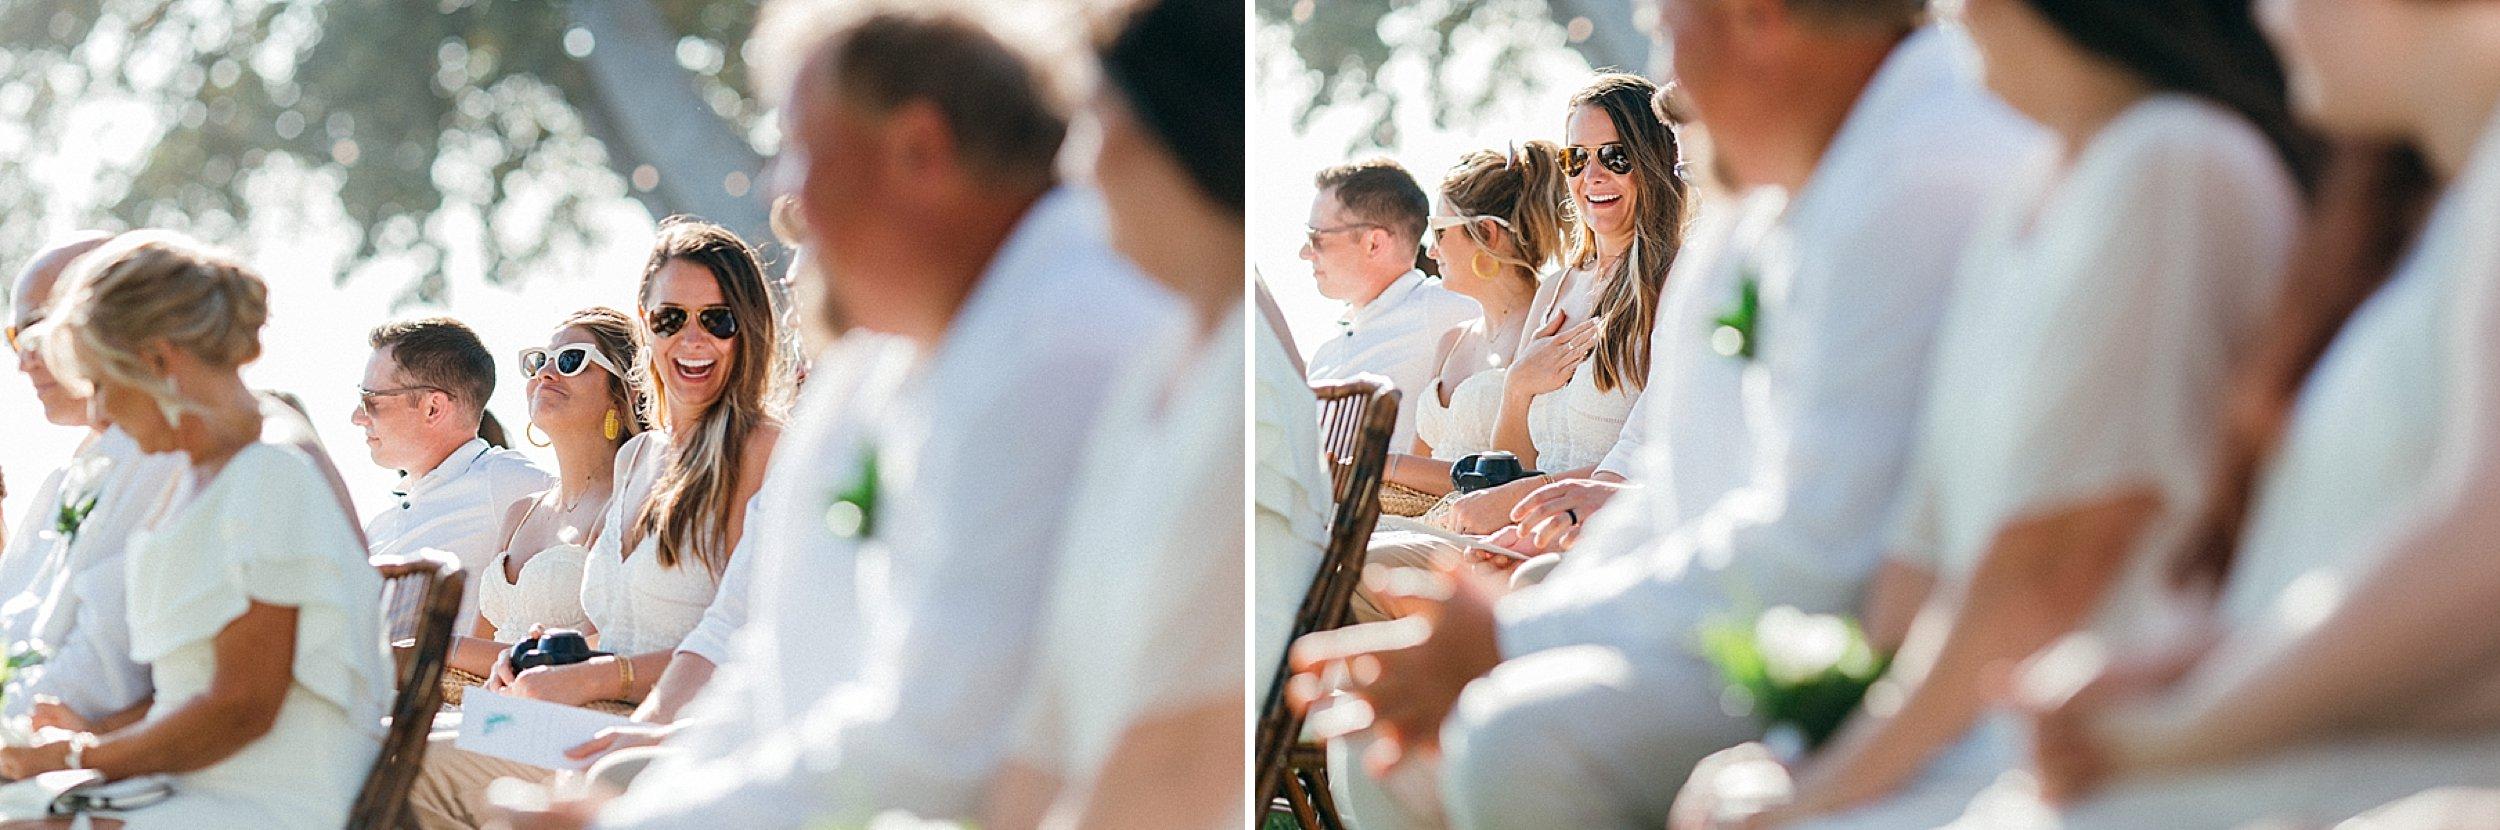 maui-wedding-at-olowalu-plantation-house_0058.jpg